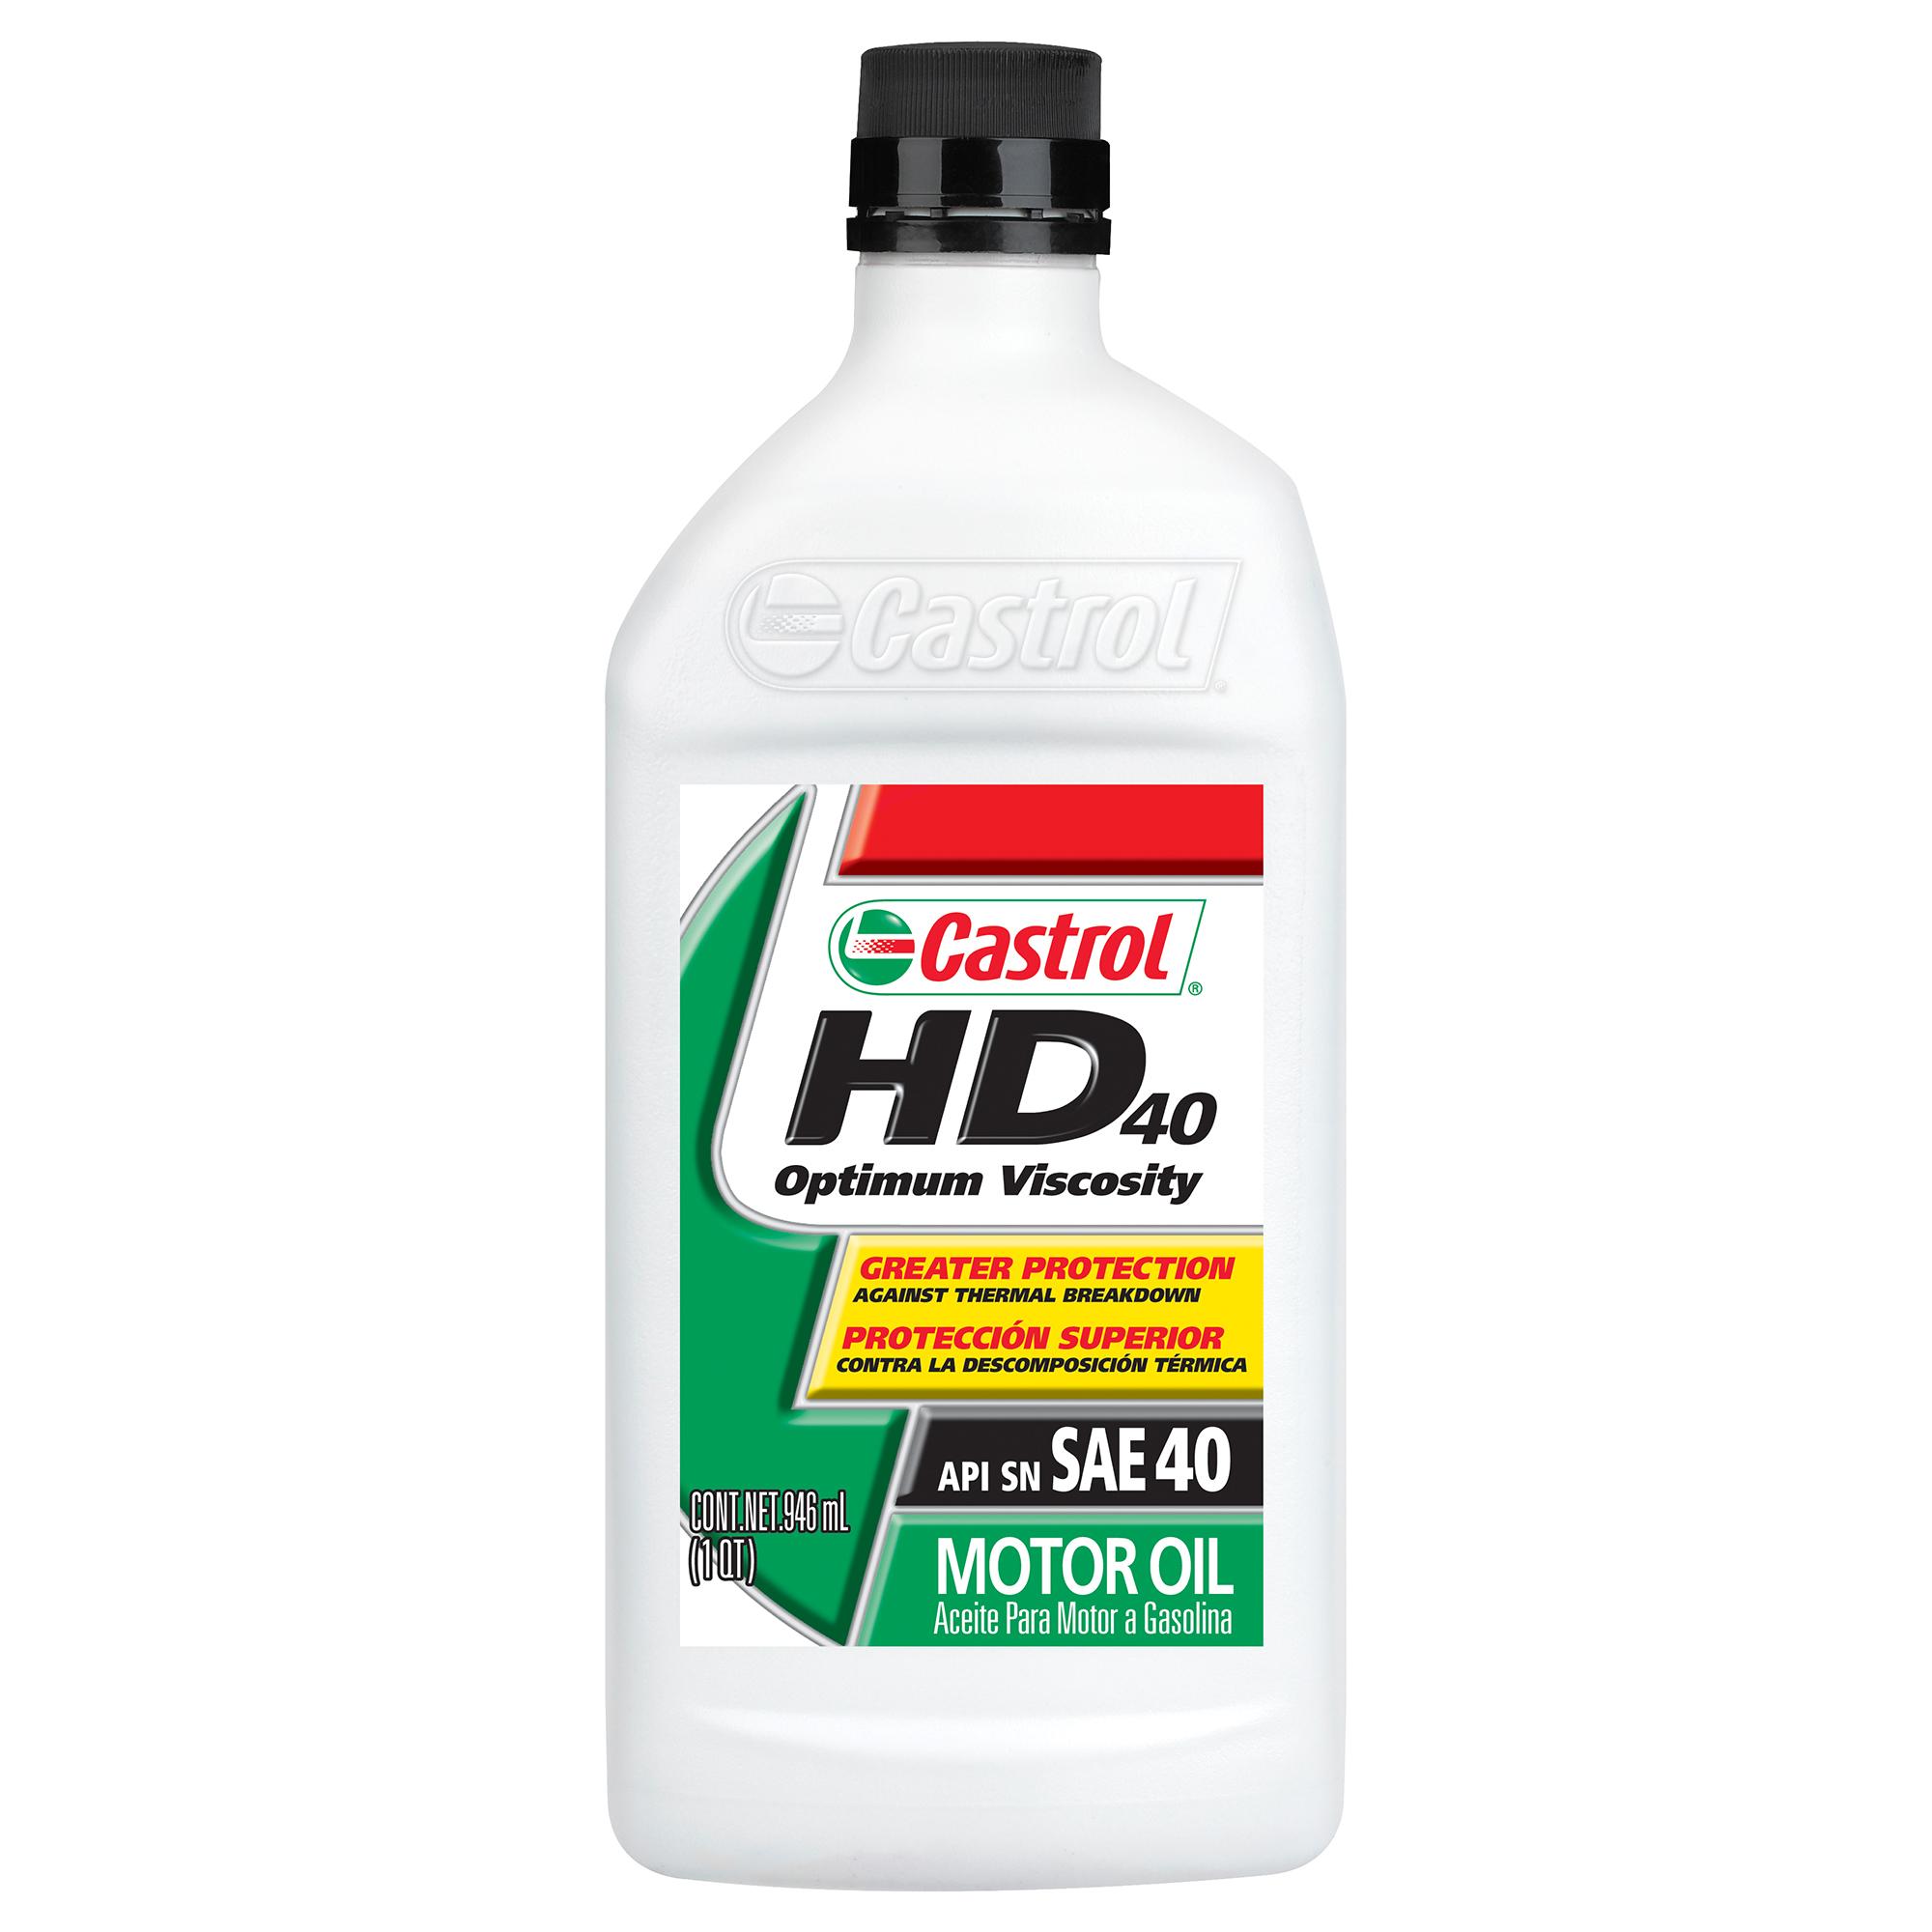 Castrol HD 40 Conventional Motor Oil, 1 QT